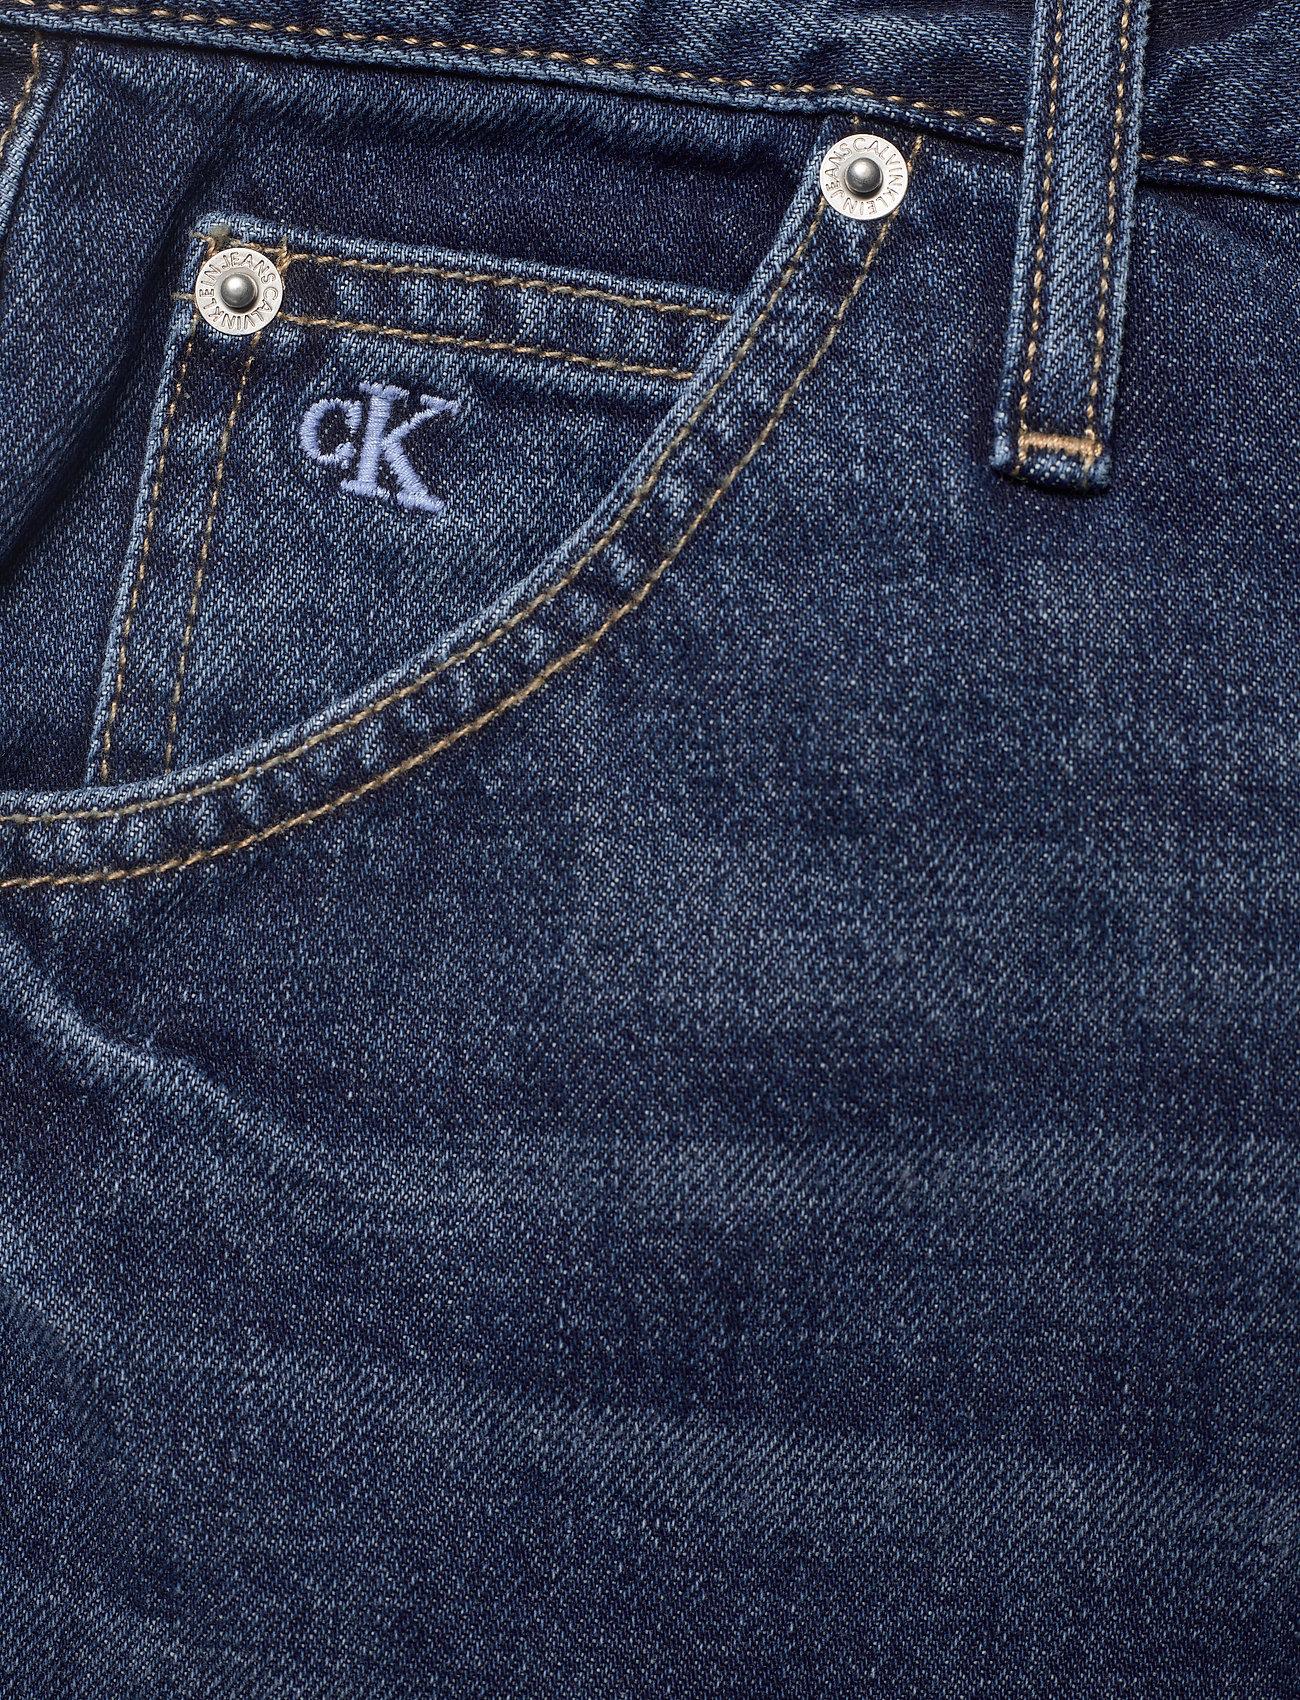 Calvin Klein Jeans - MOM JEAN - straight regular - bb139 - dark blue utility - 2